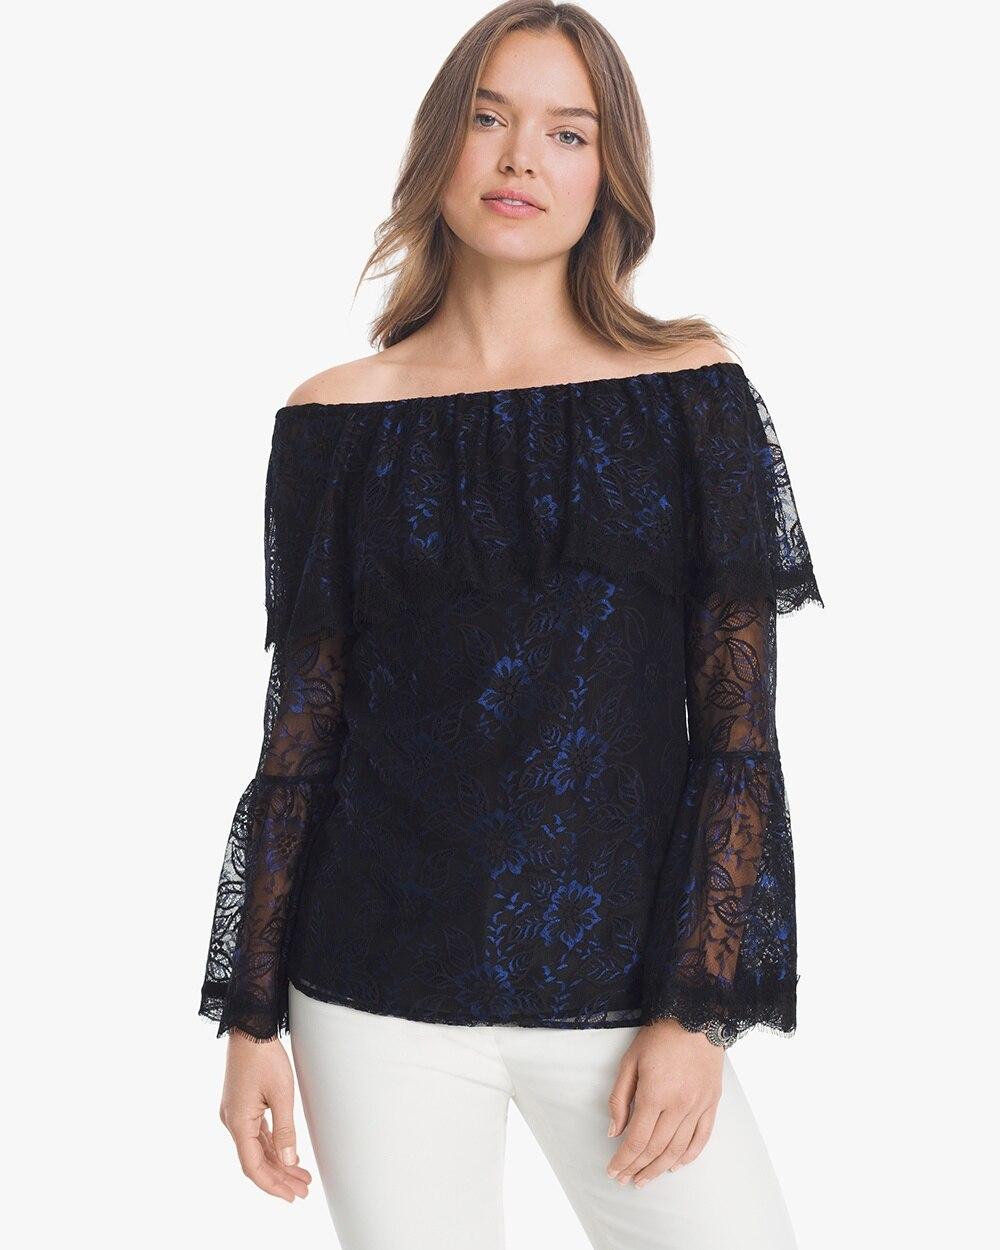 f175d37f02 Off-the-Shoulder Lace Top - White House Black Market